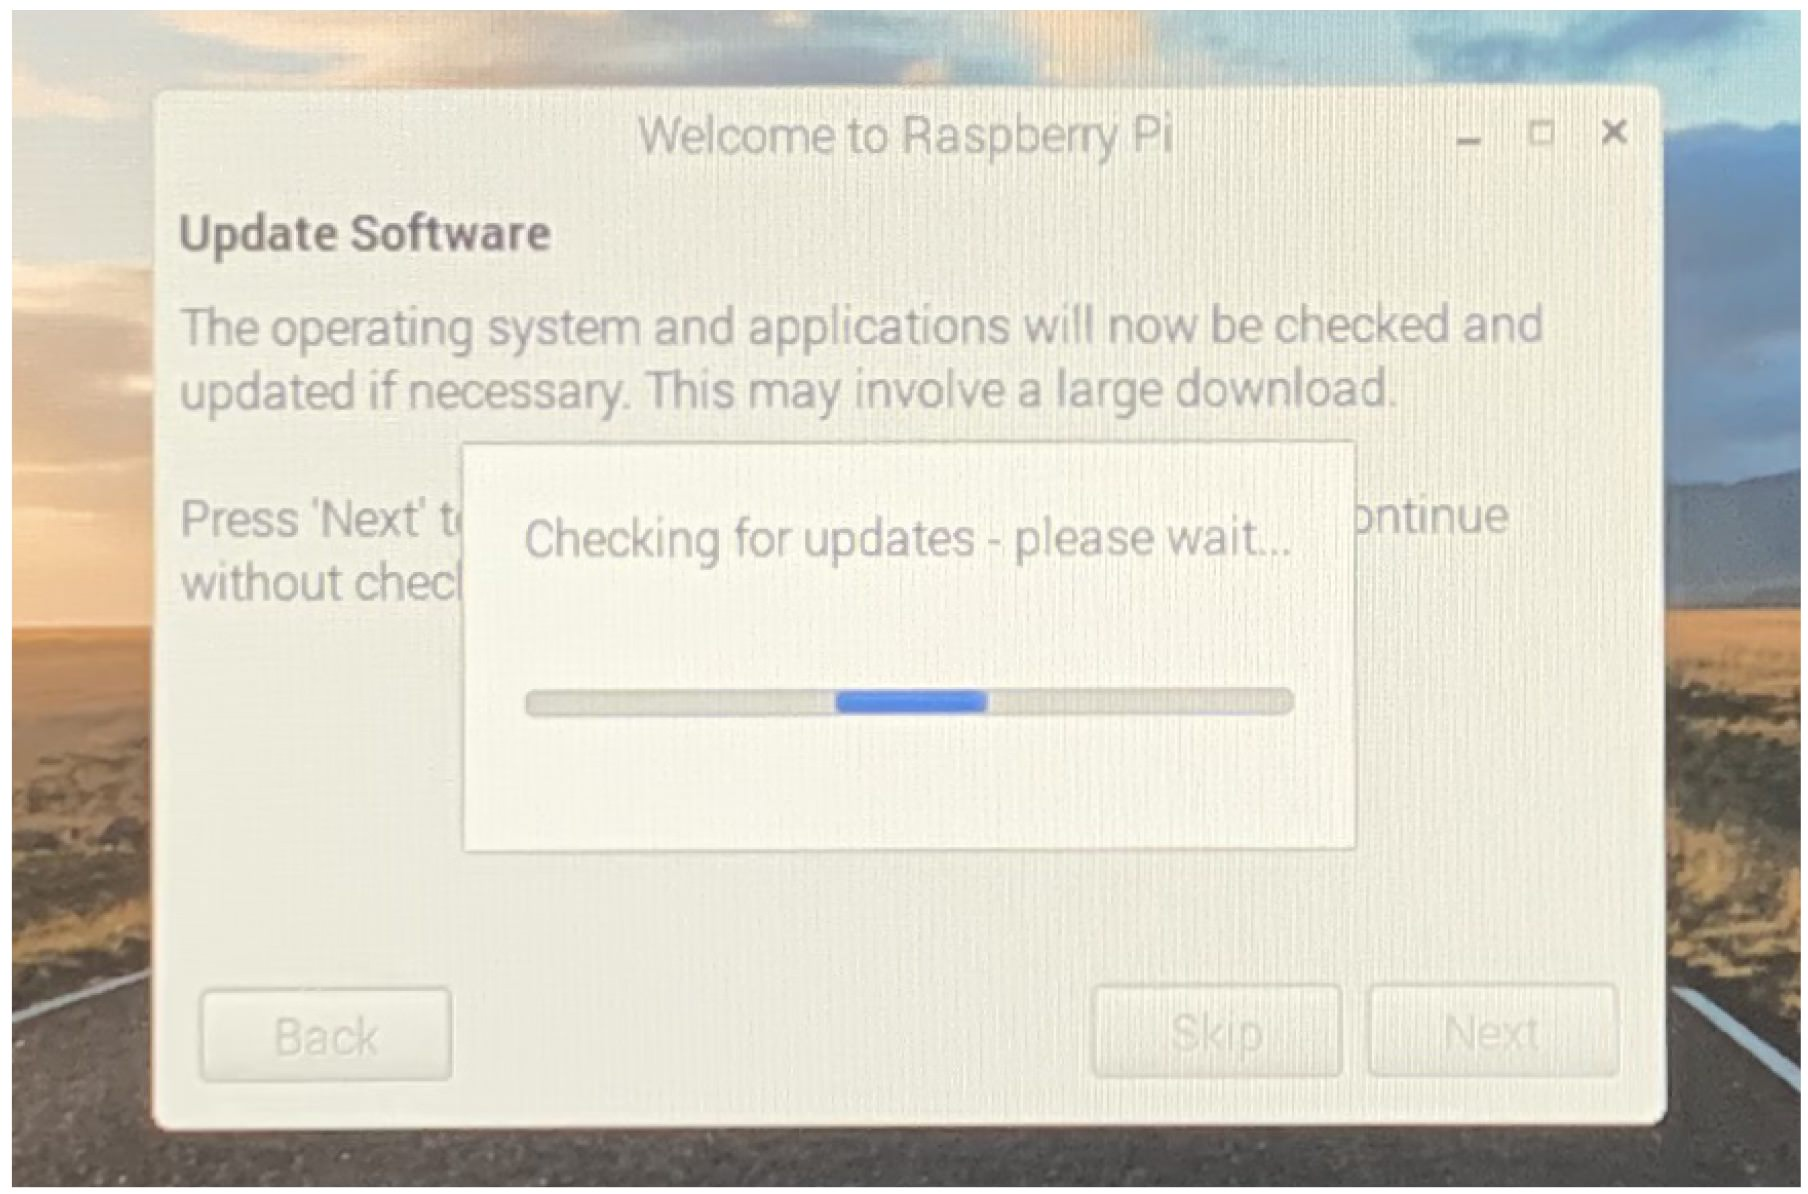 Raspbianセットアップ7